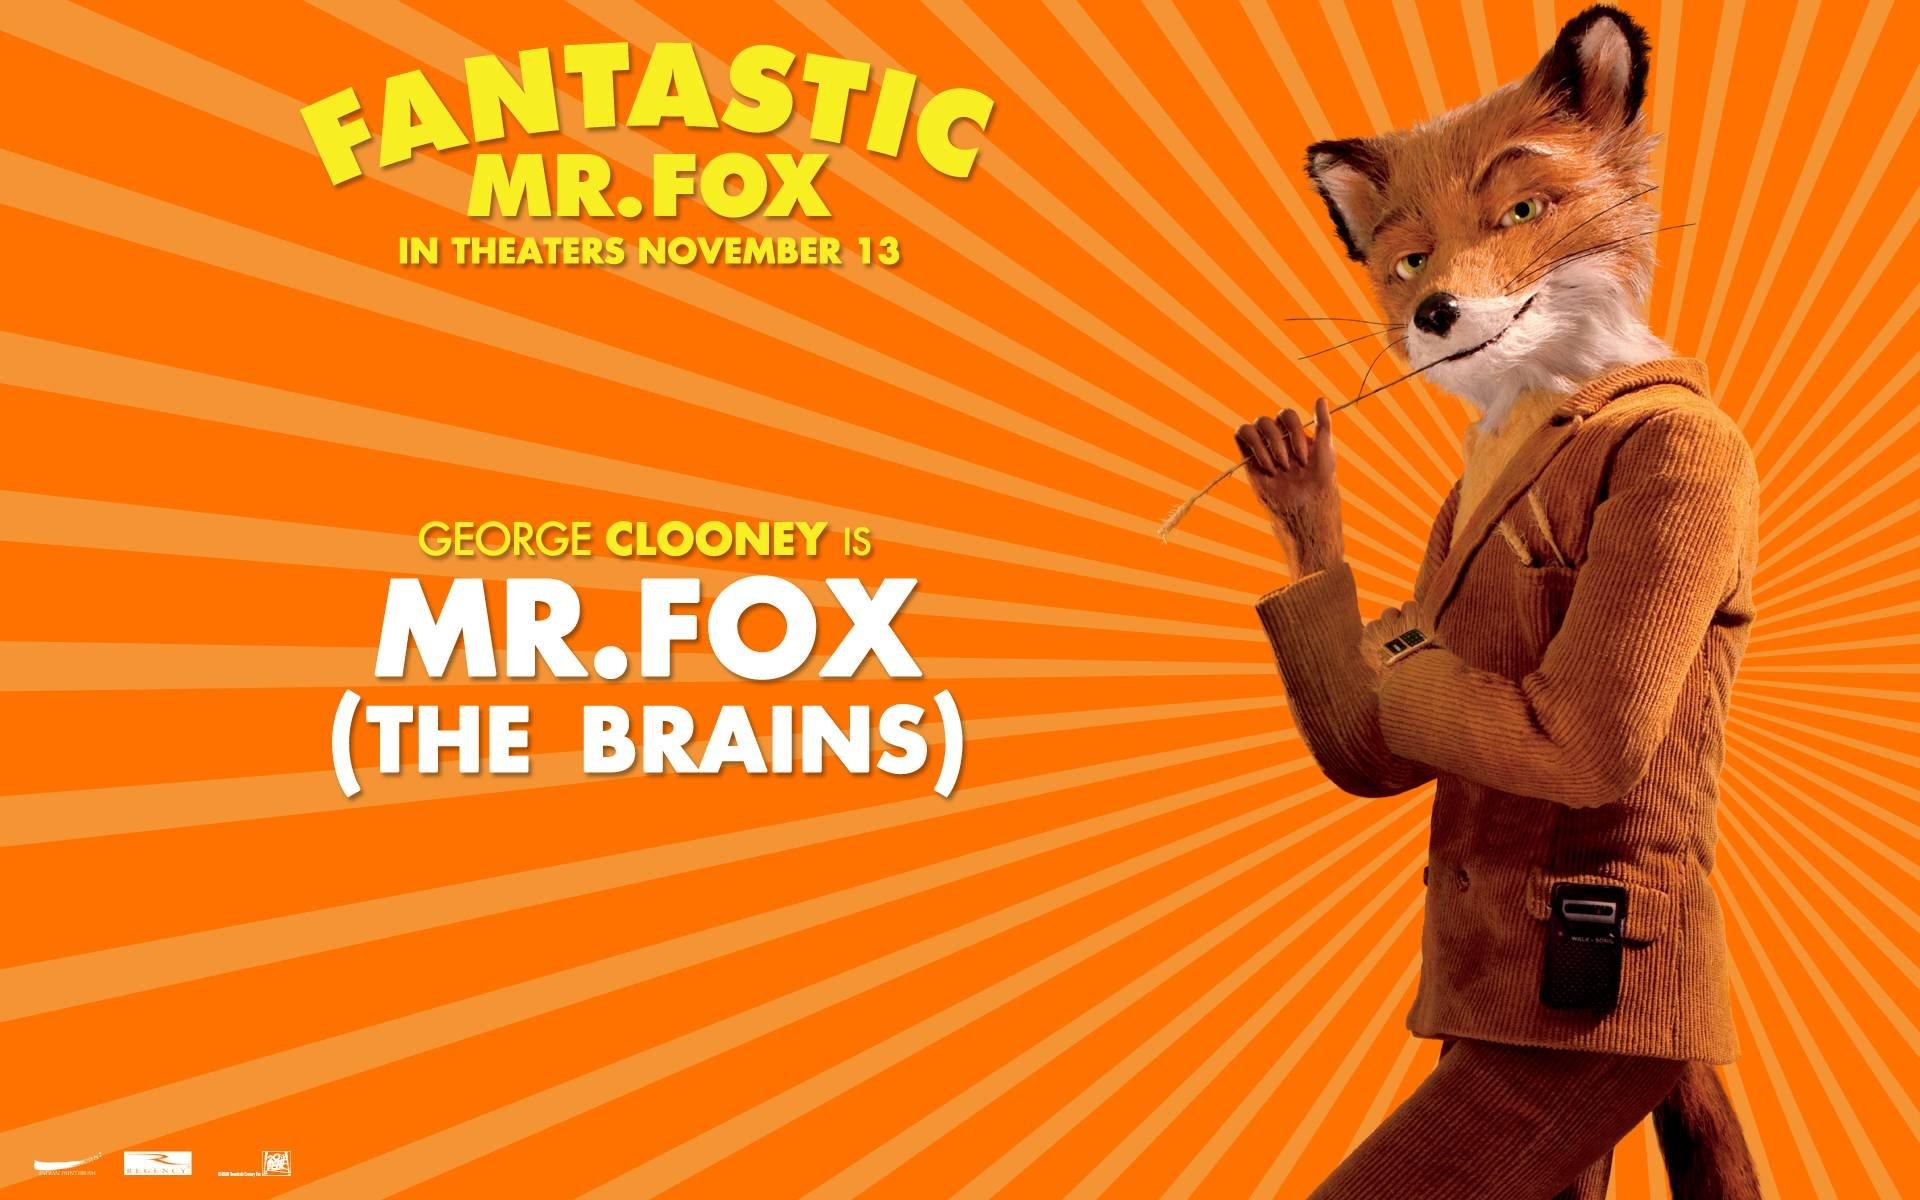 Fantastic Mr Fox Wallpapers Hd For Desktop Backgrounds